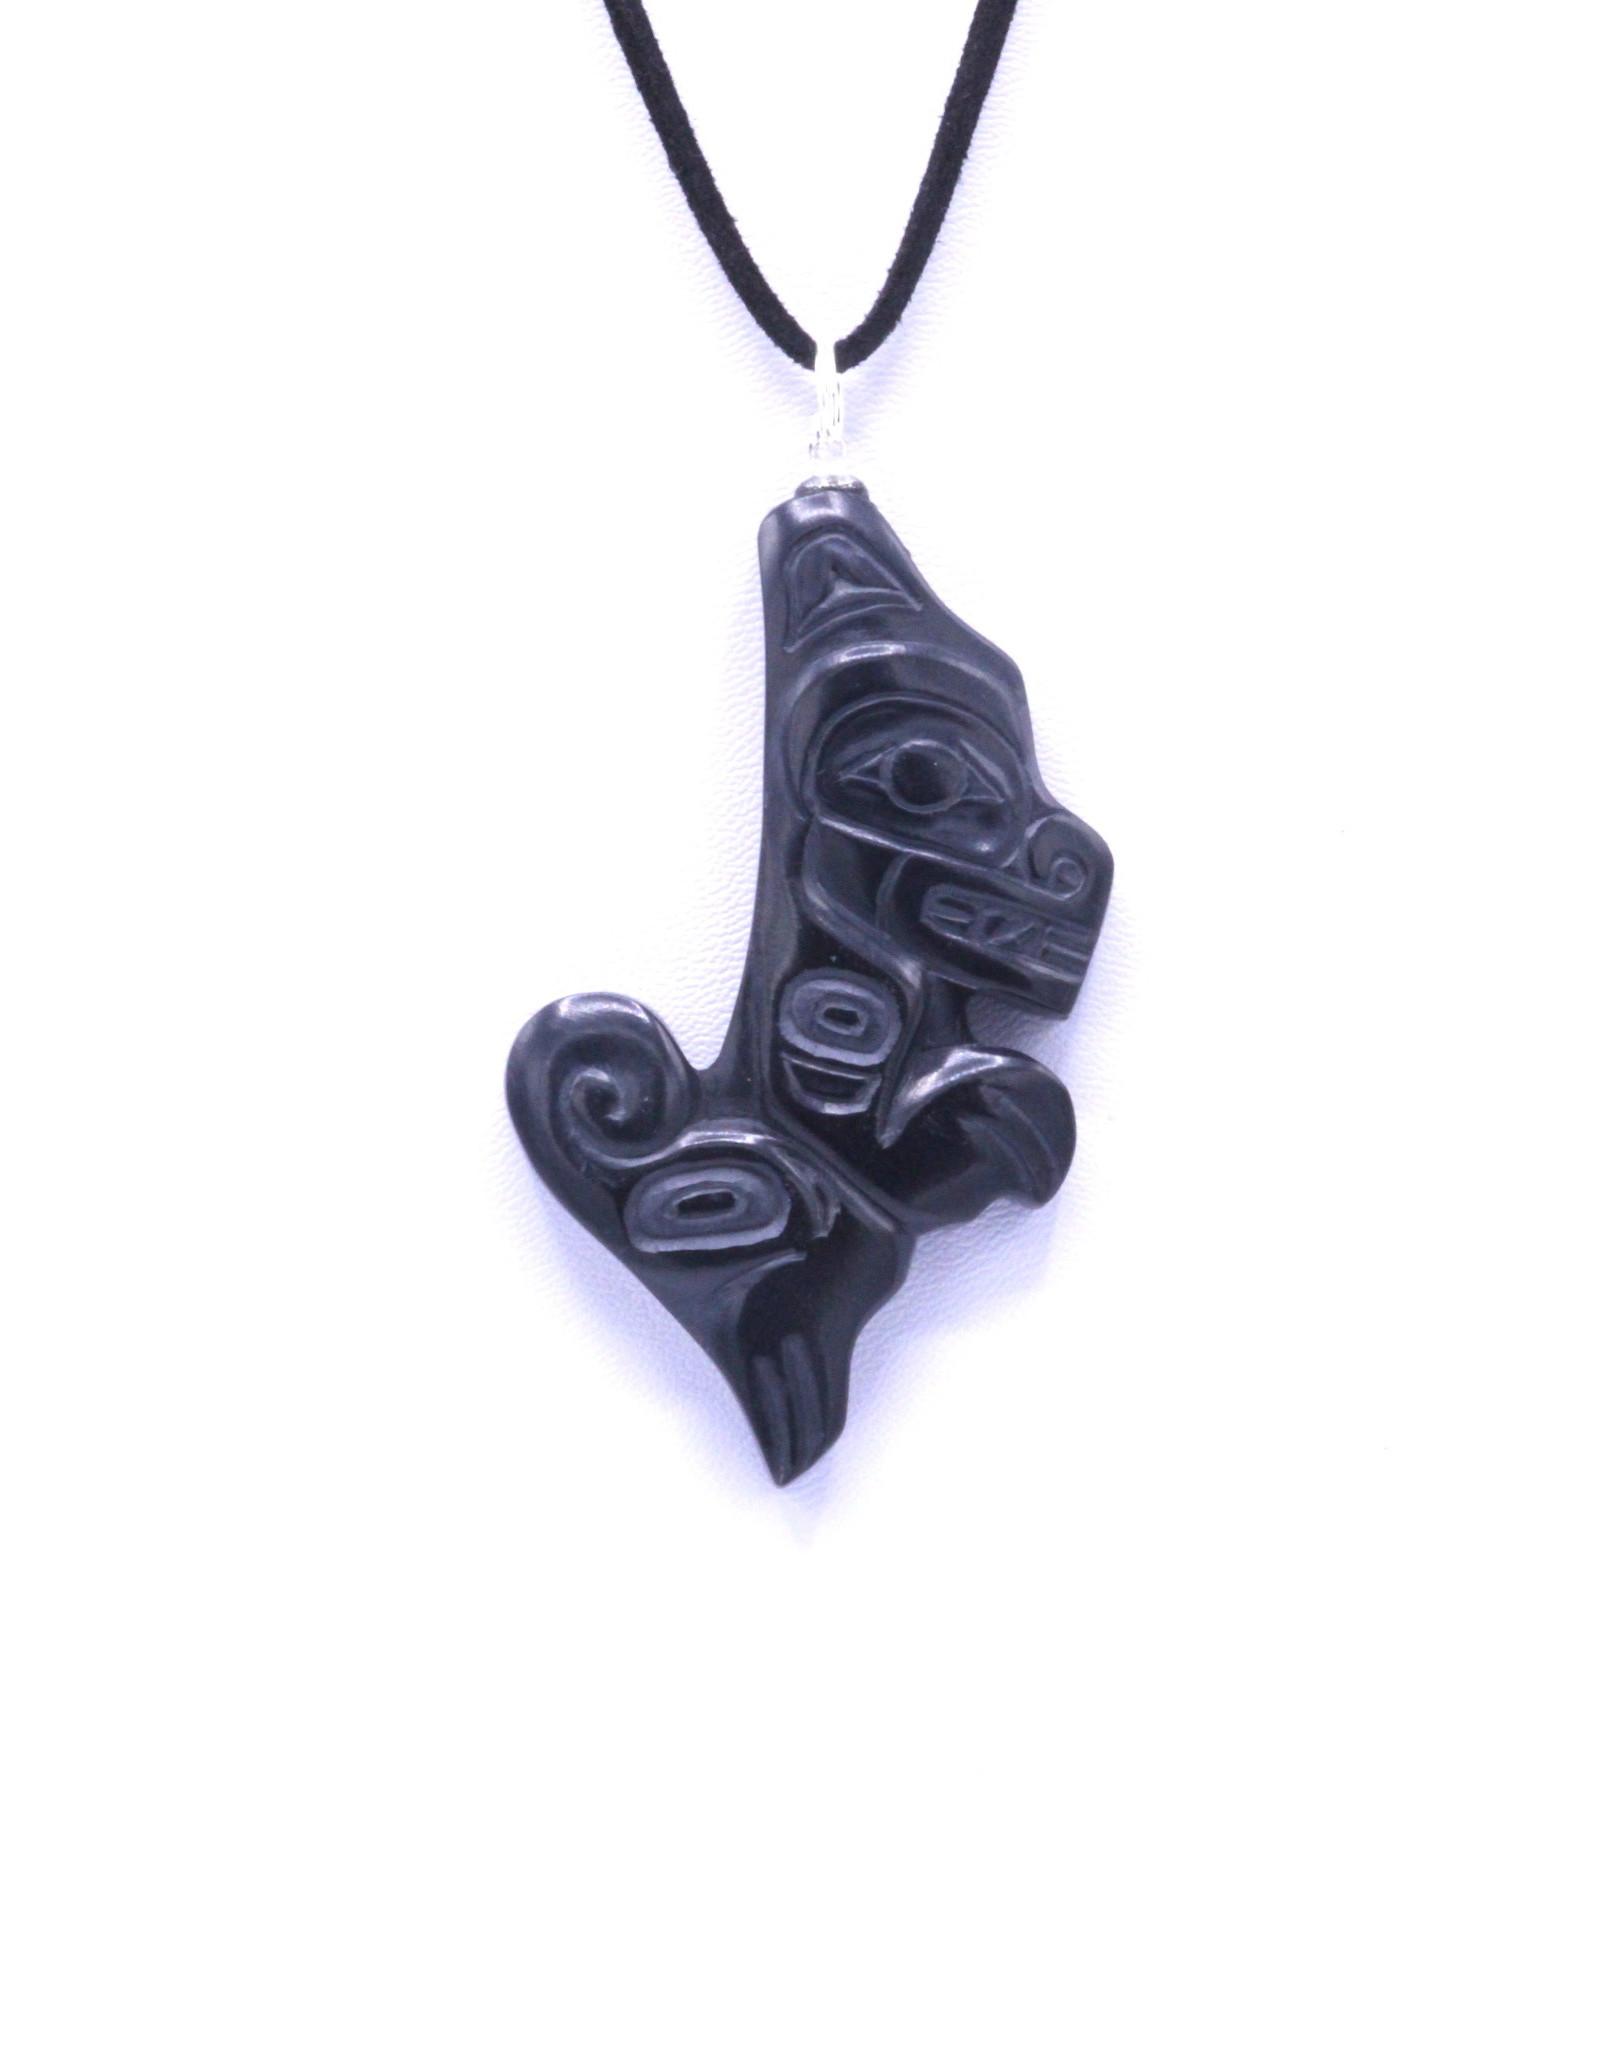 Argillite Pendant by Gryn White - GWP05